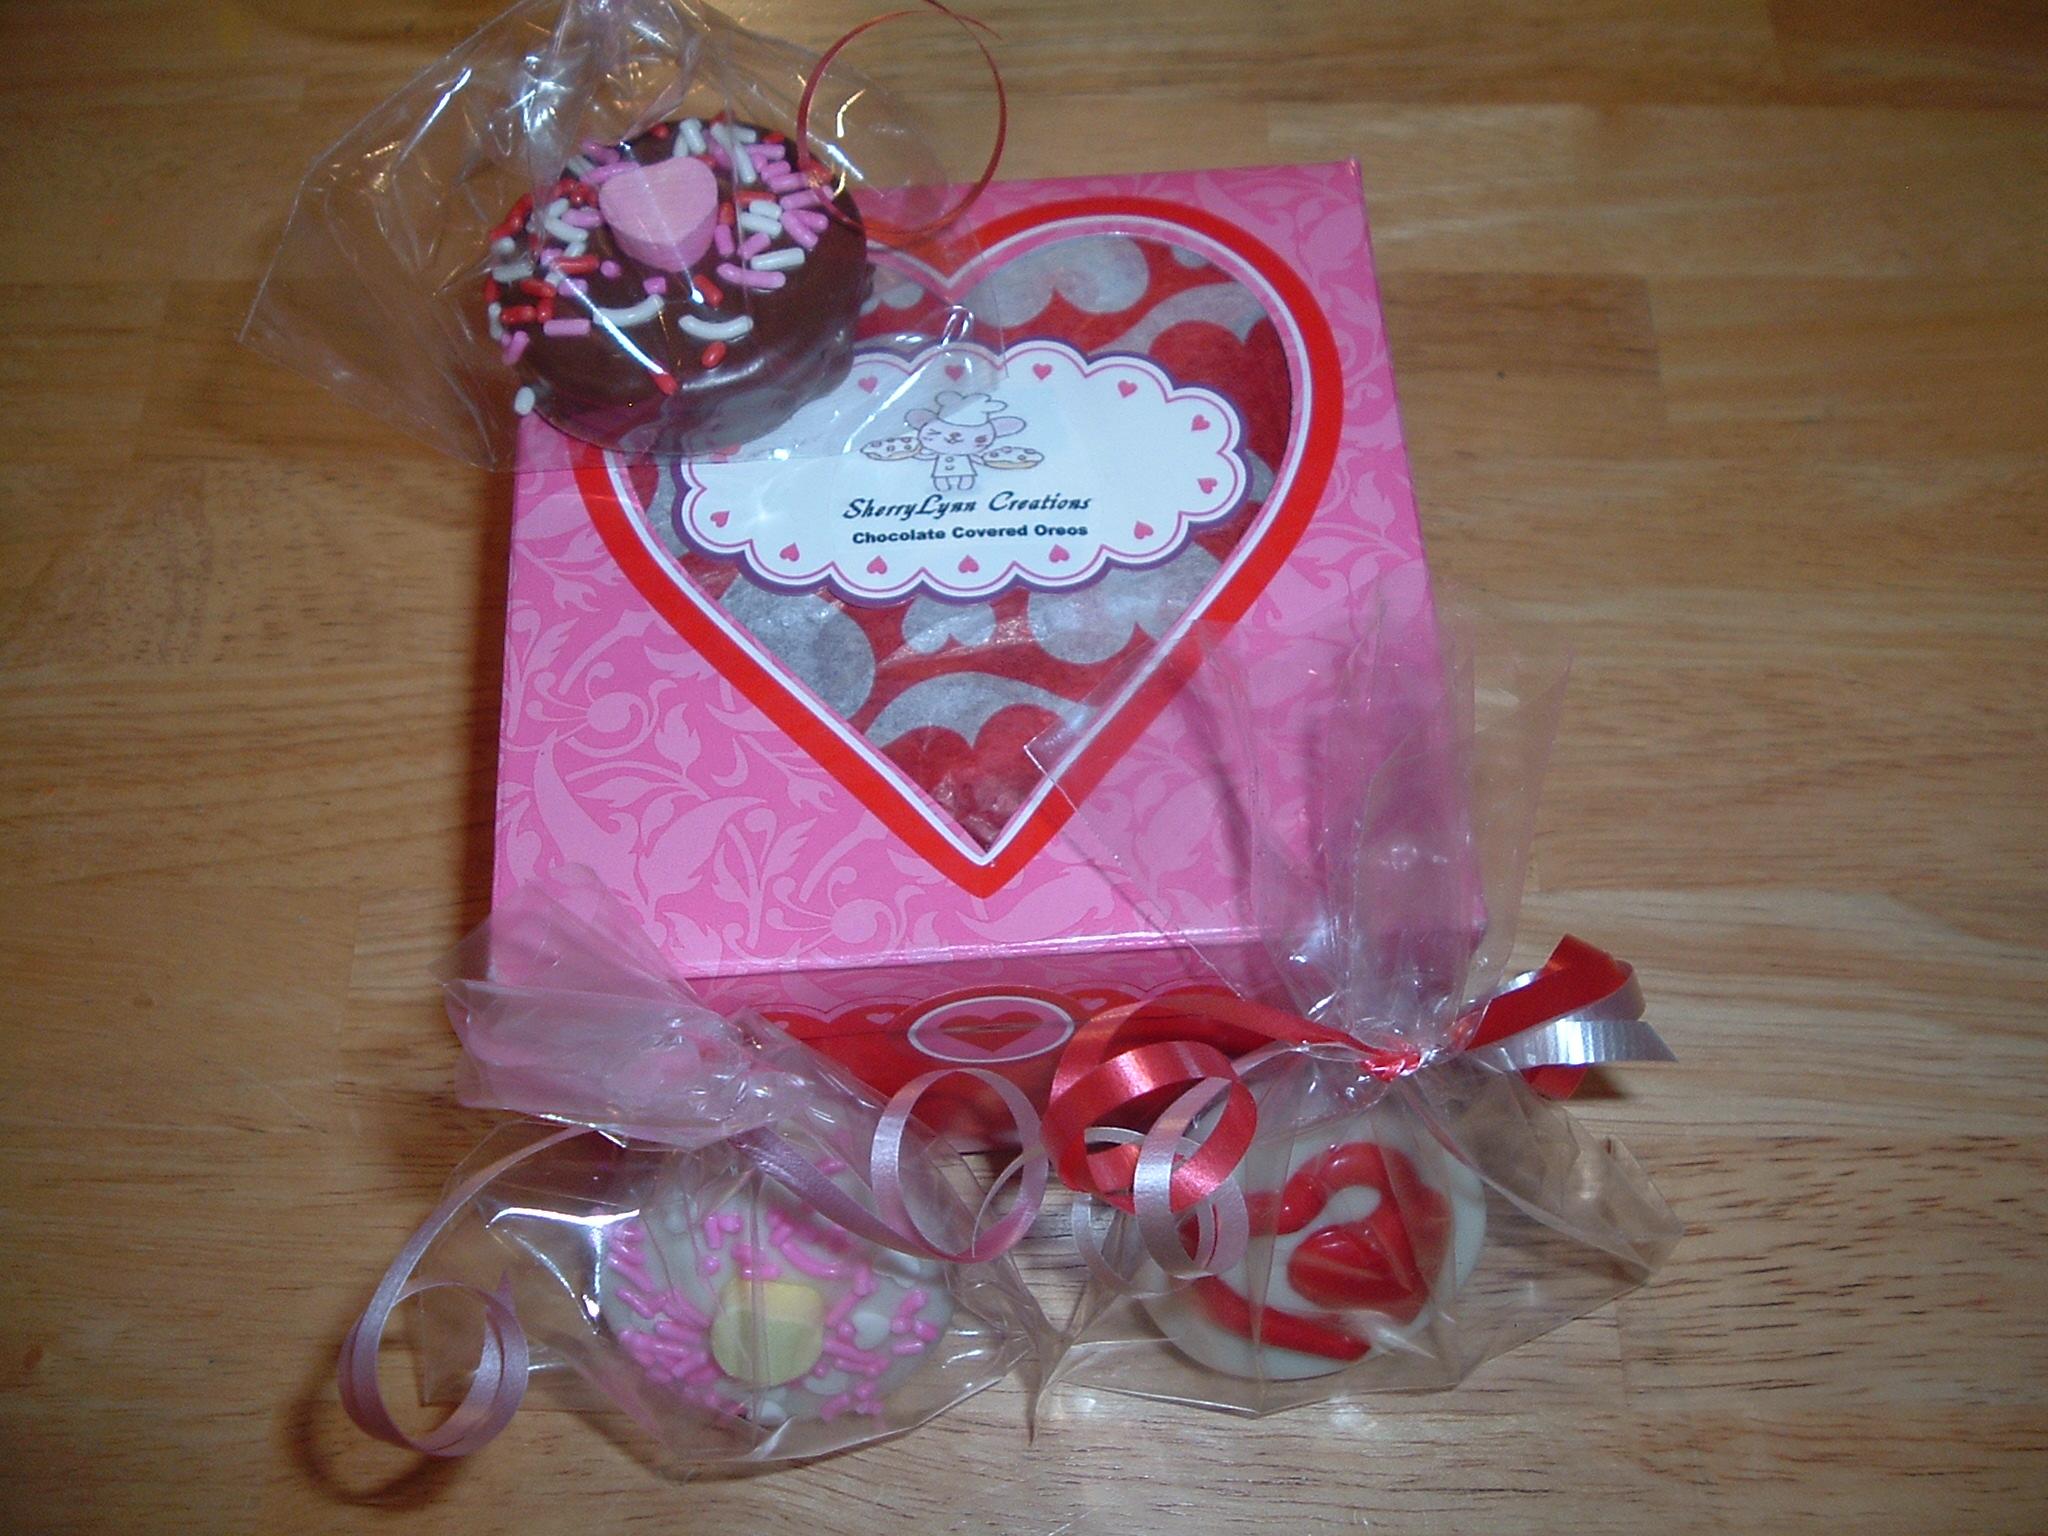 SherryLynn Creations - Gift Baskets & Boxes